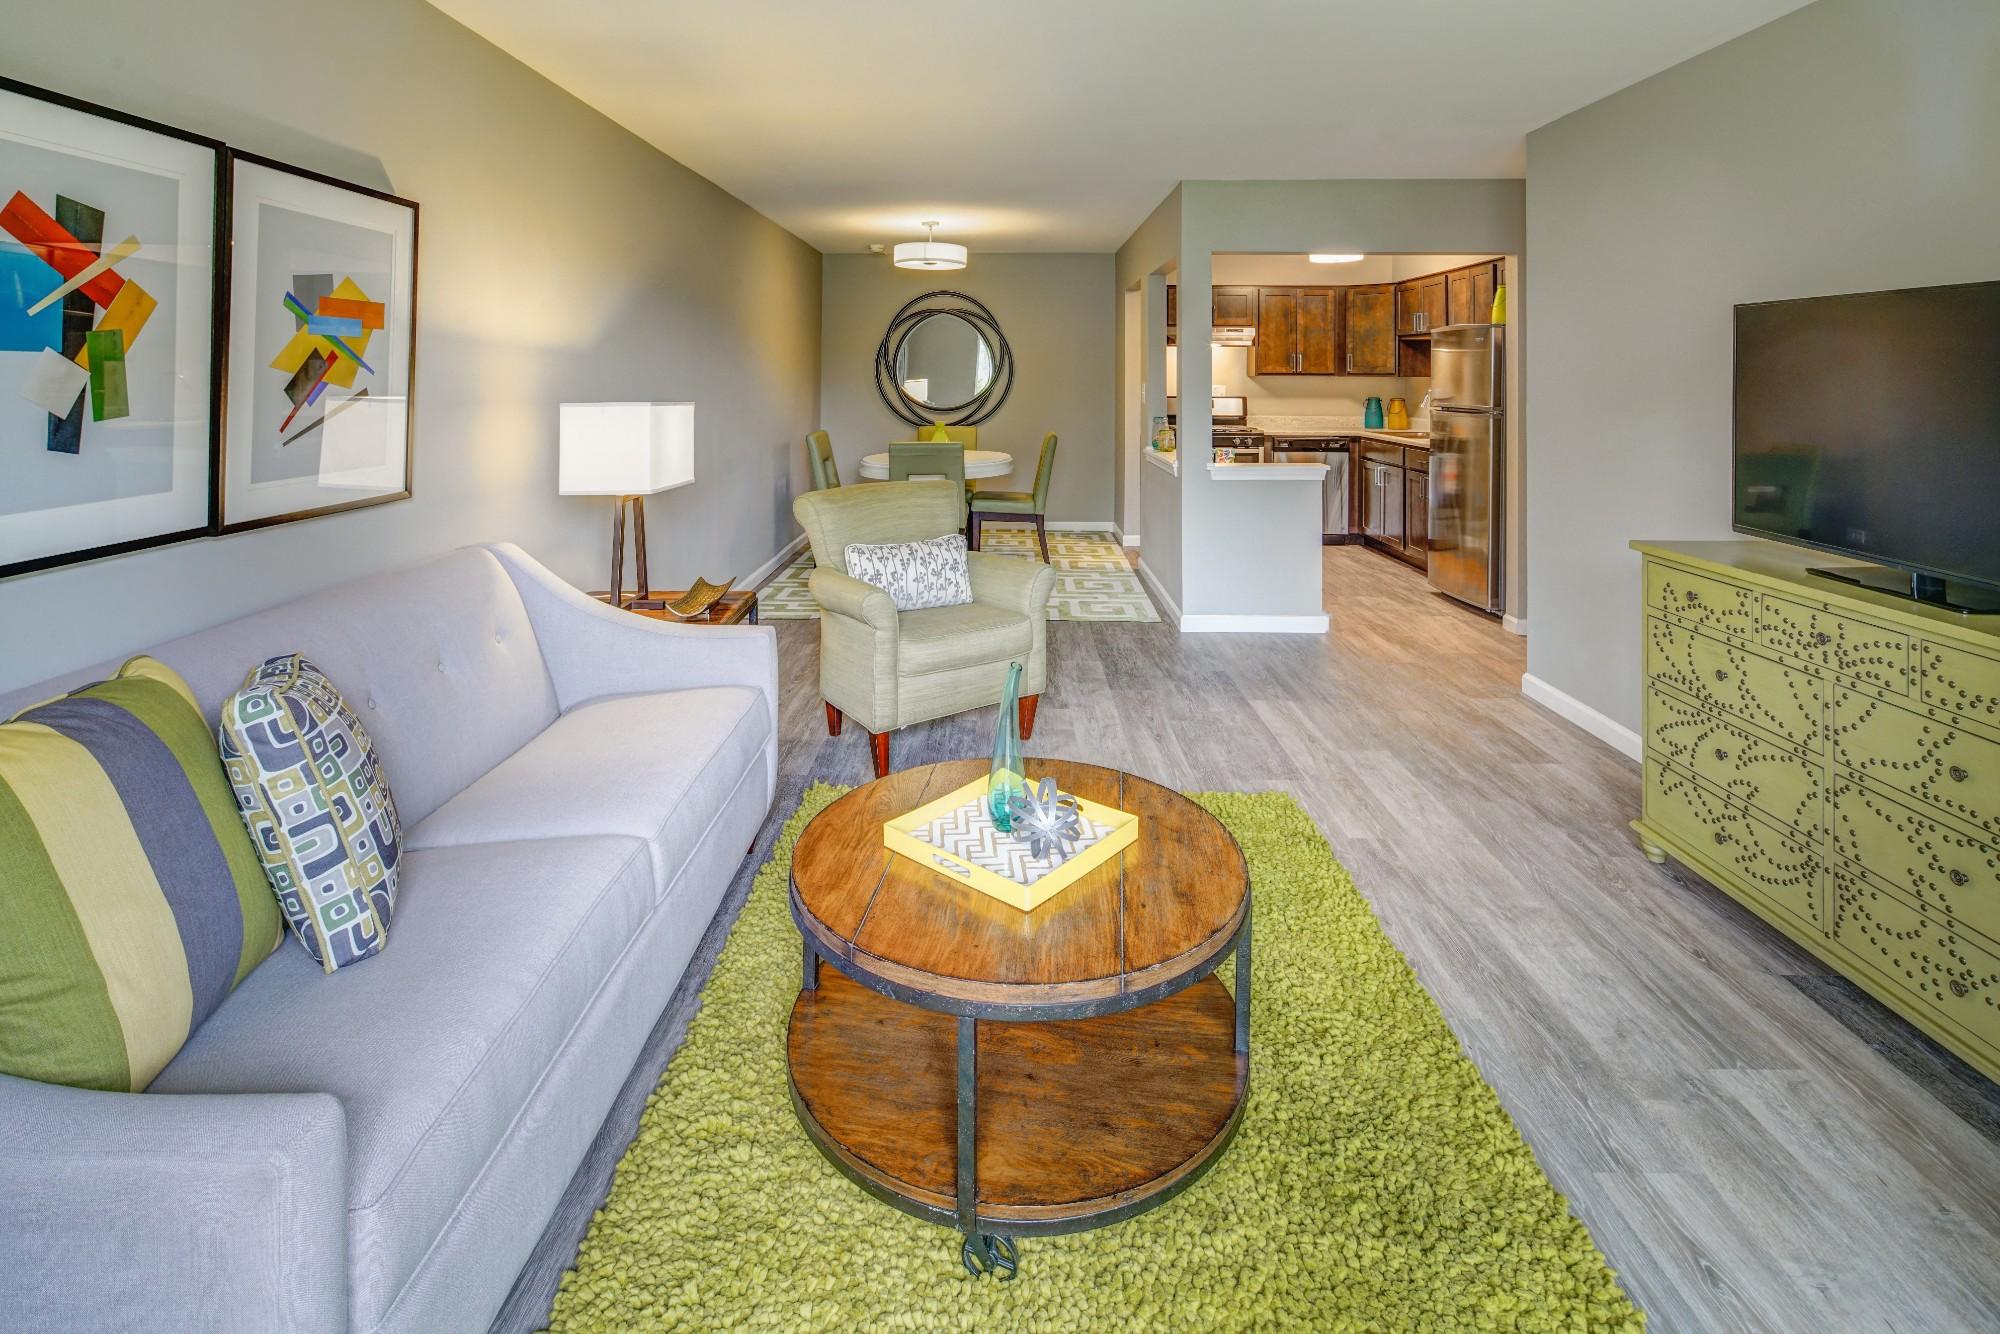 Trendy Living Room at Carol Stream Crossing, Illinois